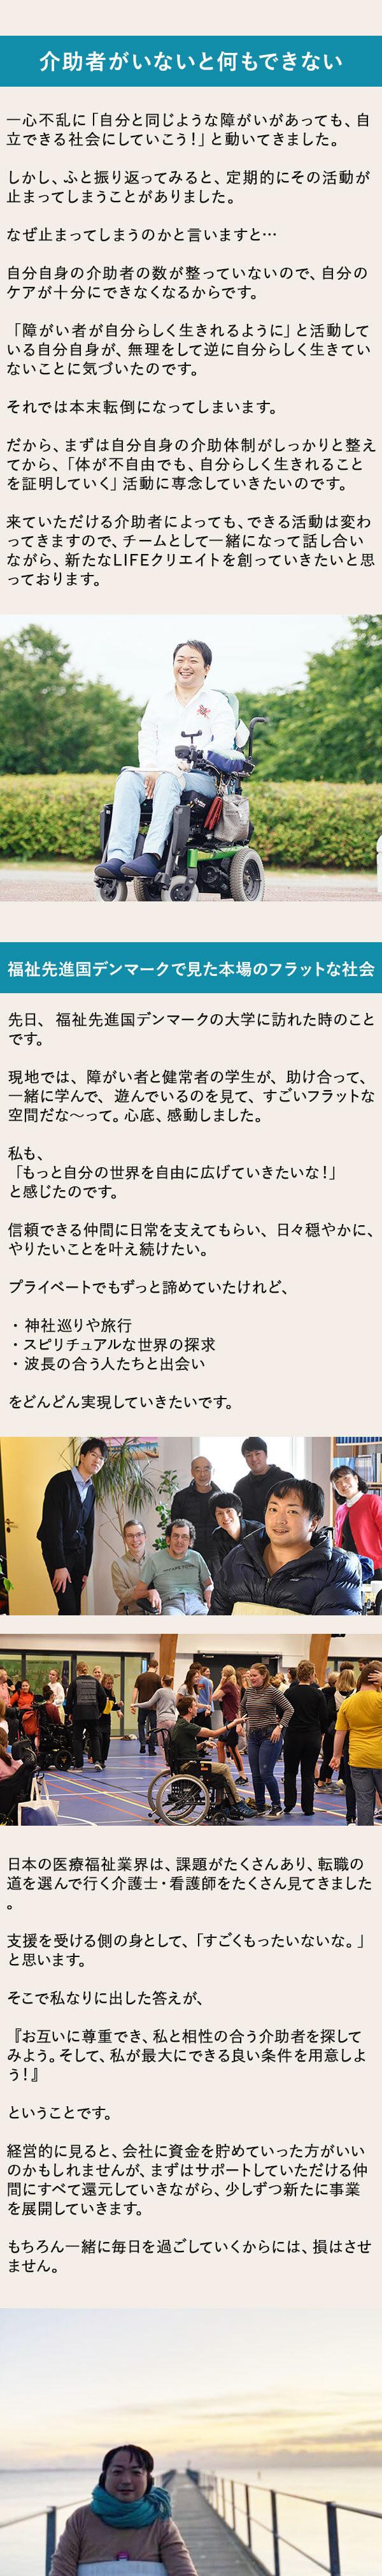 lp_sp_09.jpg